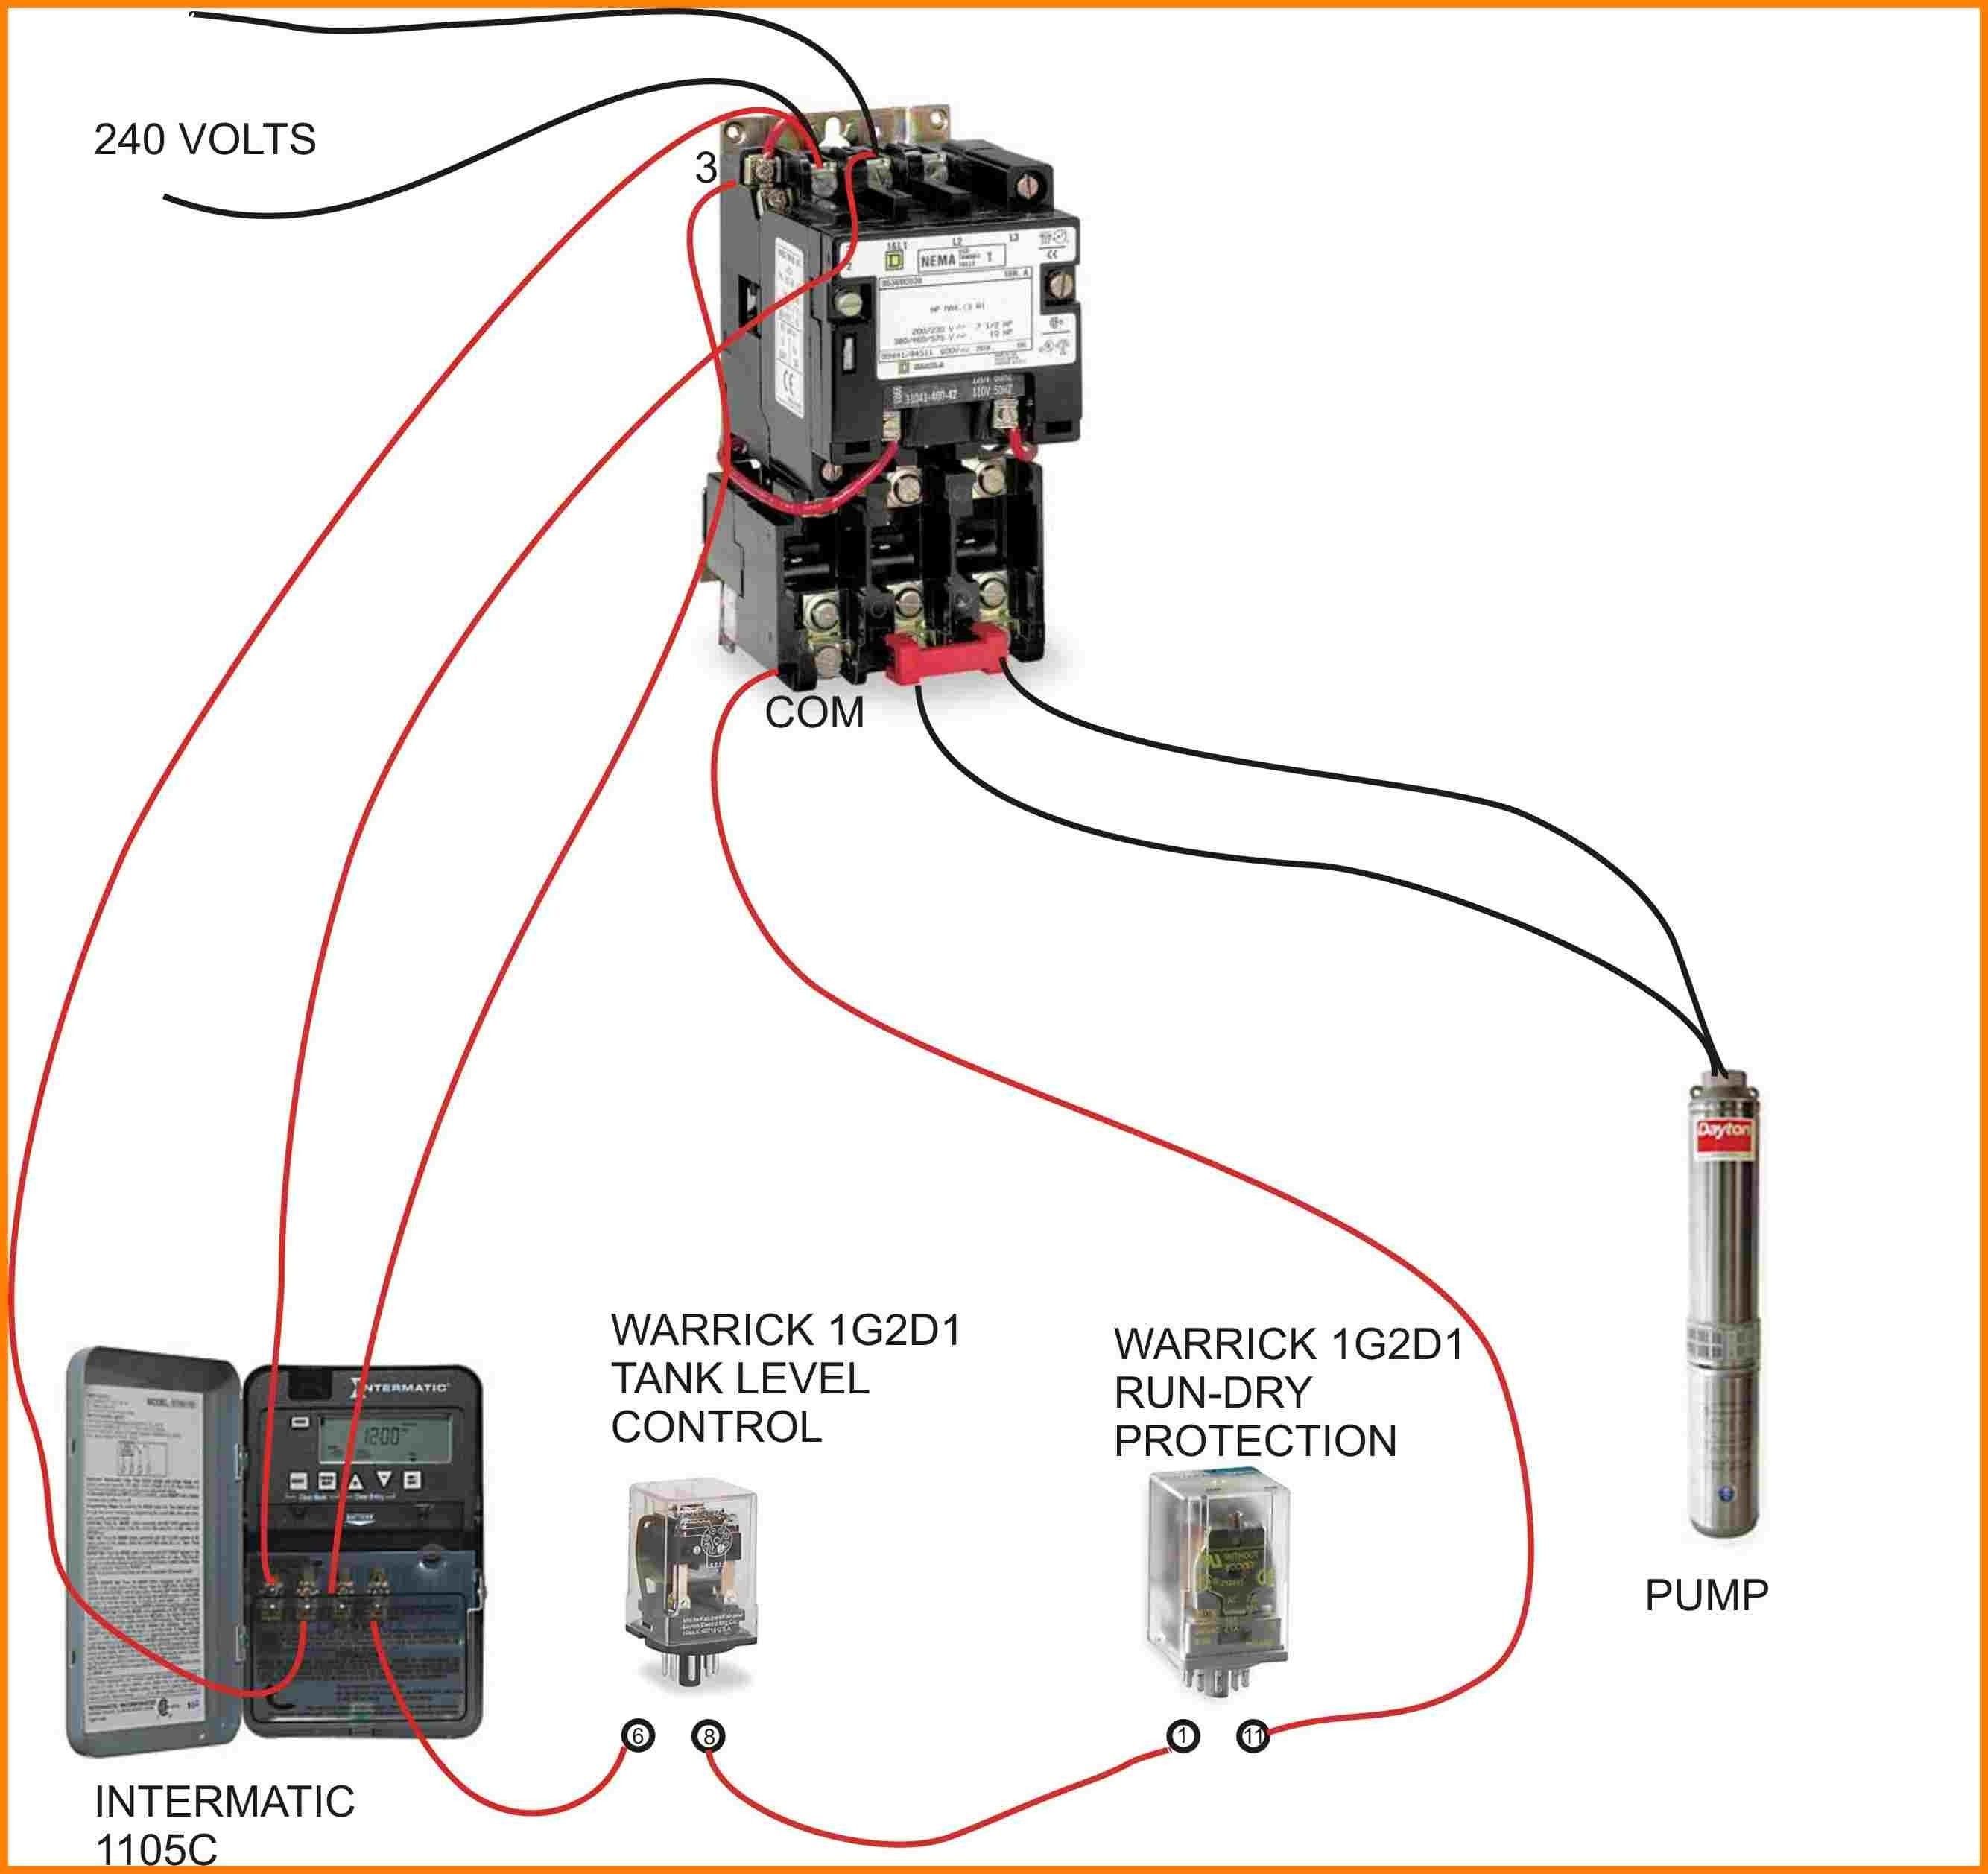 Compressor Contactor Wiring - Wiring Diagram Detailed - 240 Volt Contactor Wiring Diagram